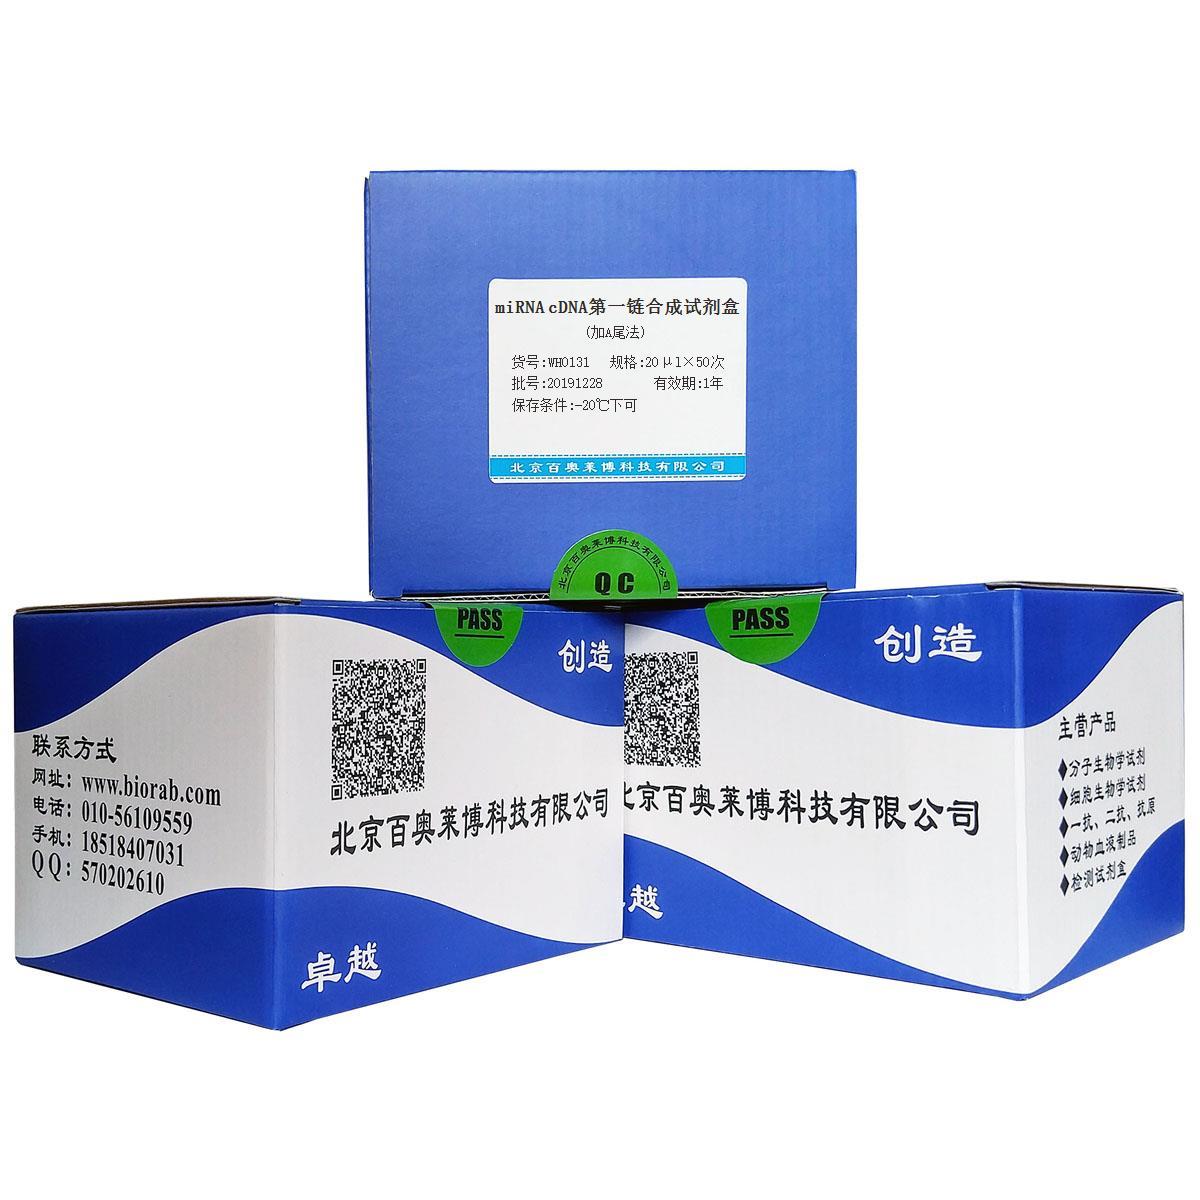 miRNA cDNA第一链合成试剂盒(加A尾法)